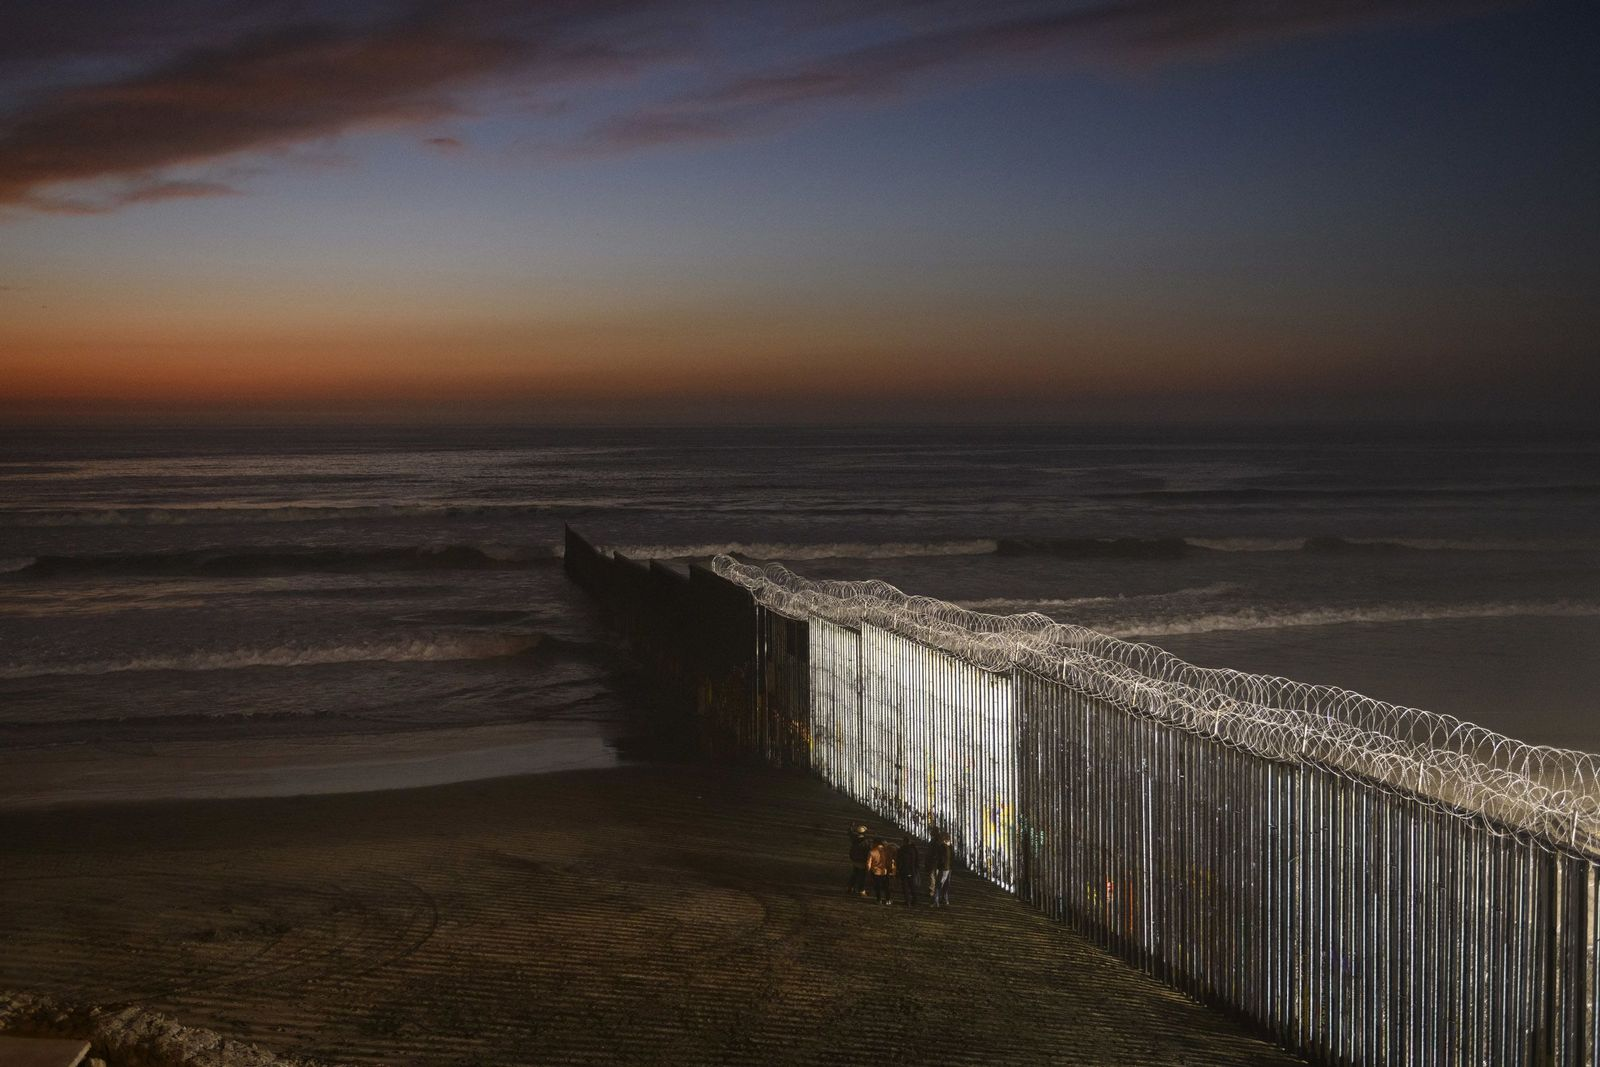 USA/ Tijuana/ Migranten-Karawane